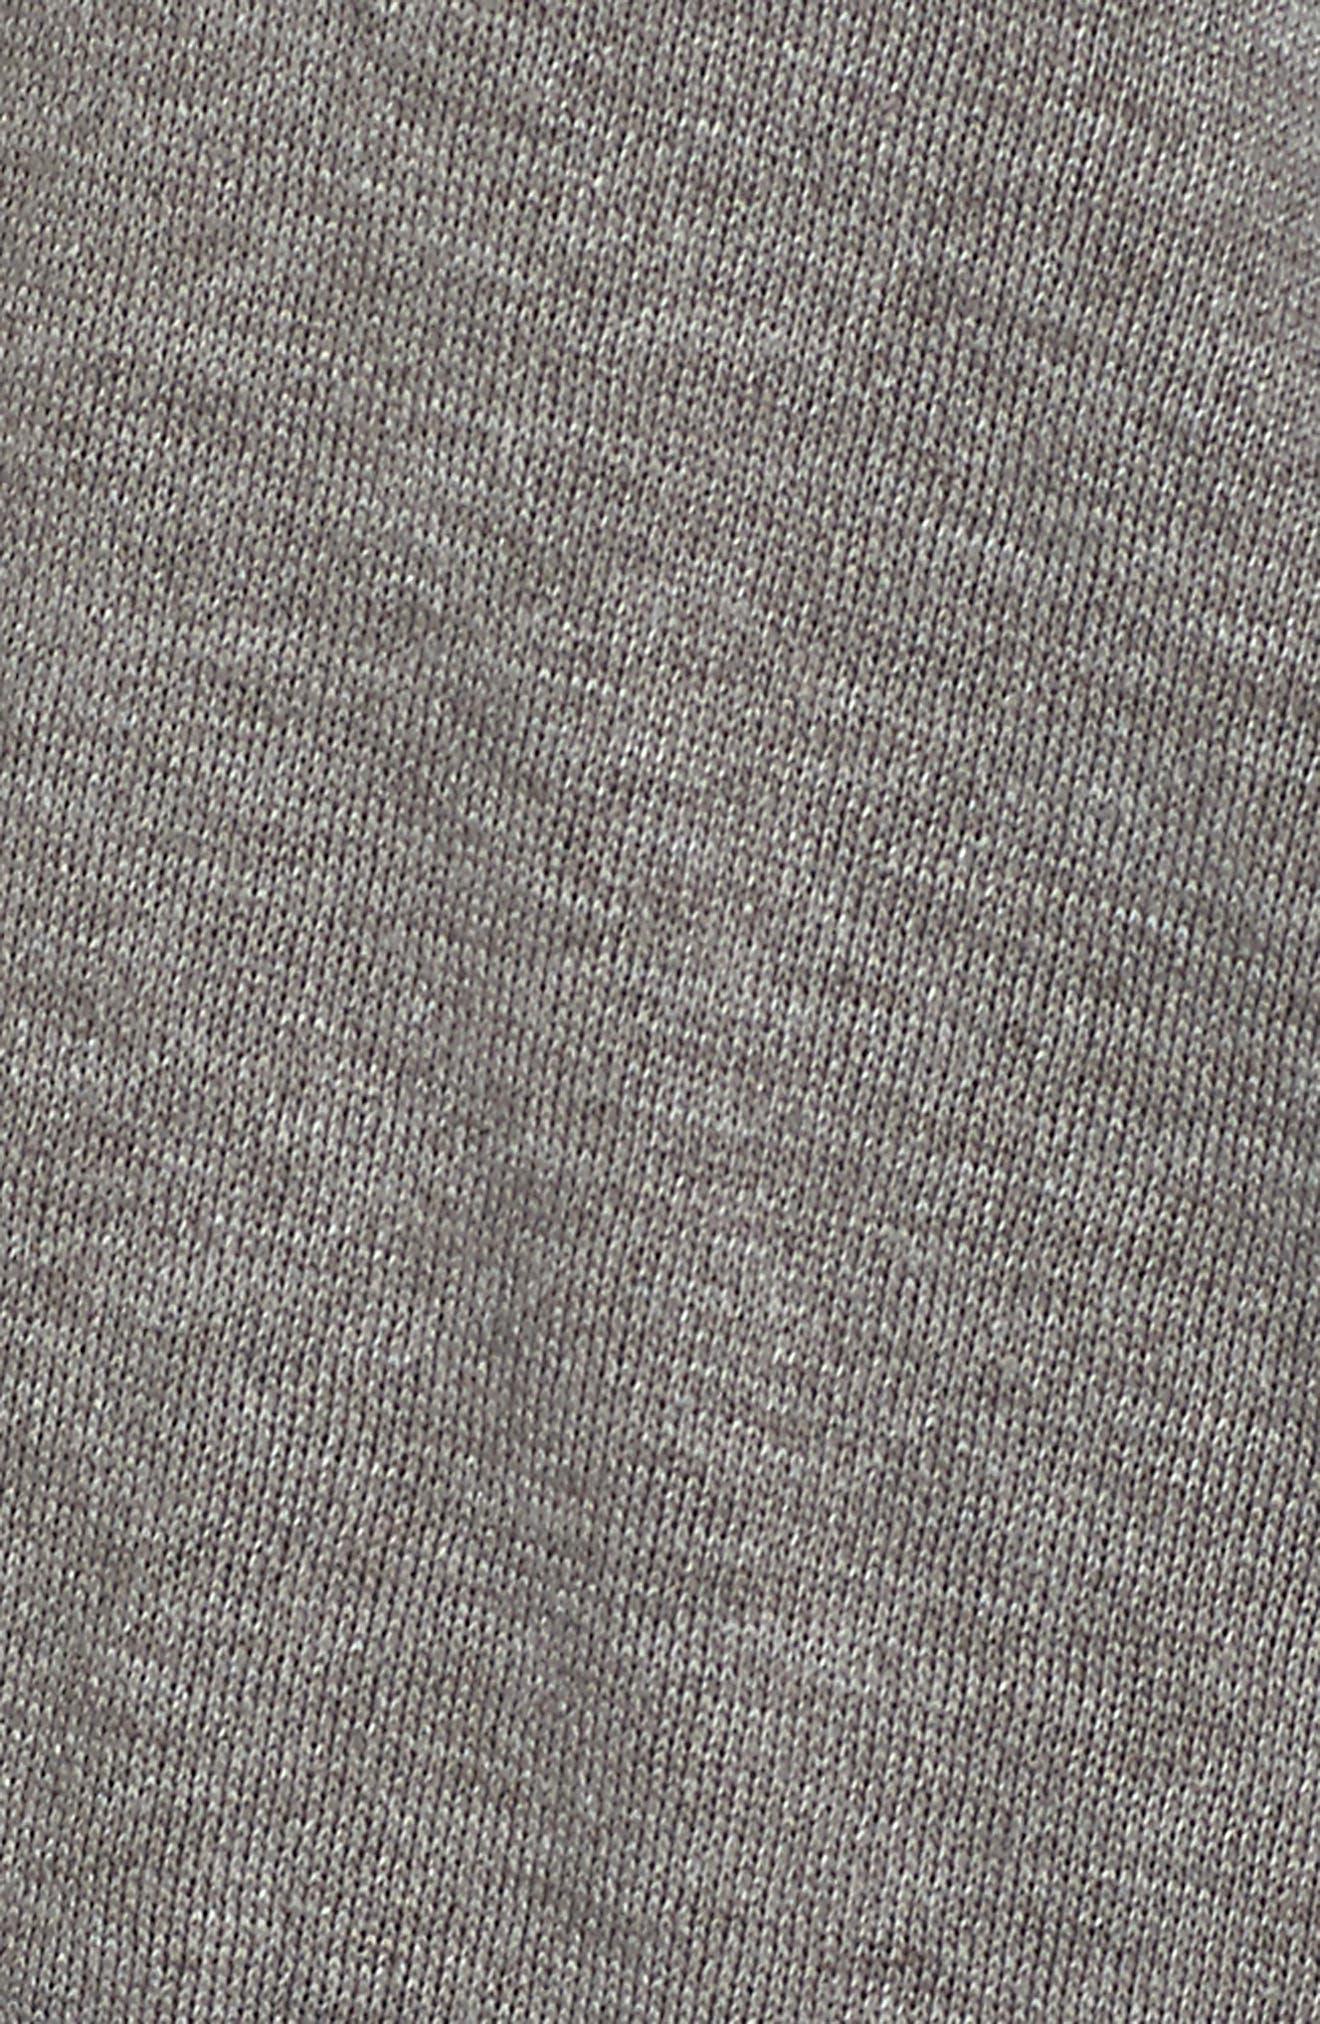 Sweatshirt Robe,                             Alternate thumbnail 5, color,                             GREY CASTLEROCK